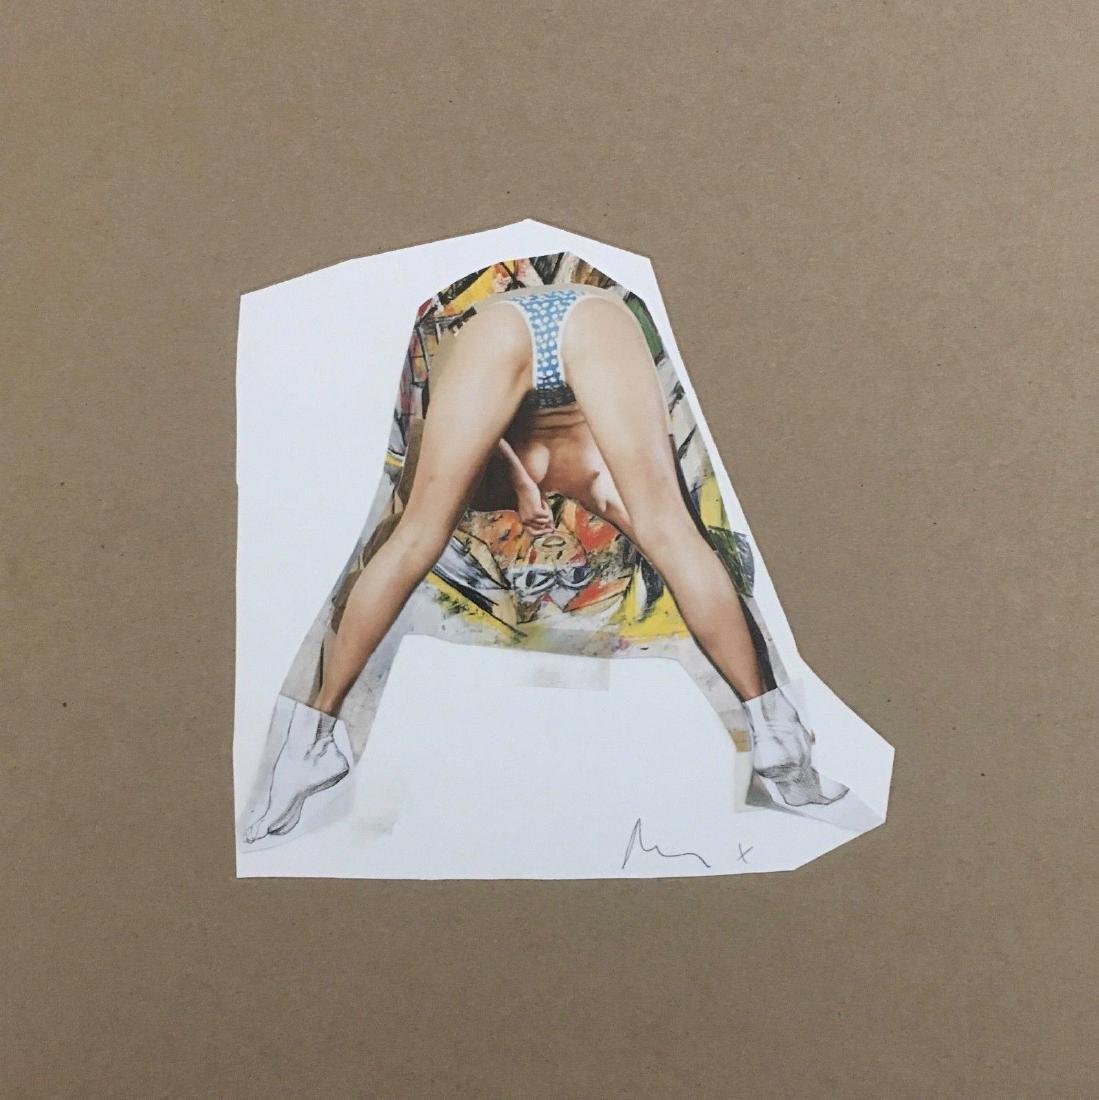 Untitled (de Kooning), Limited Edition Mixed Media,